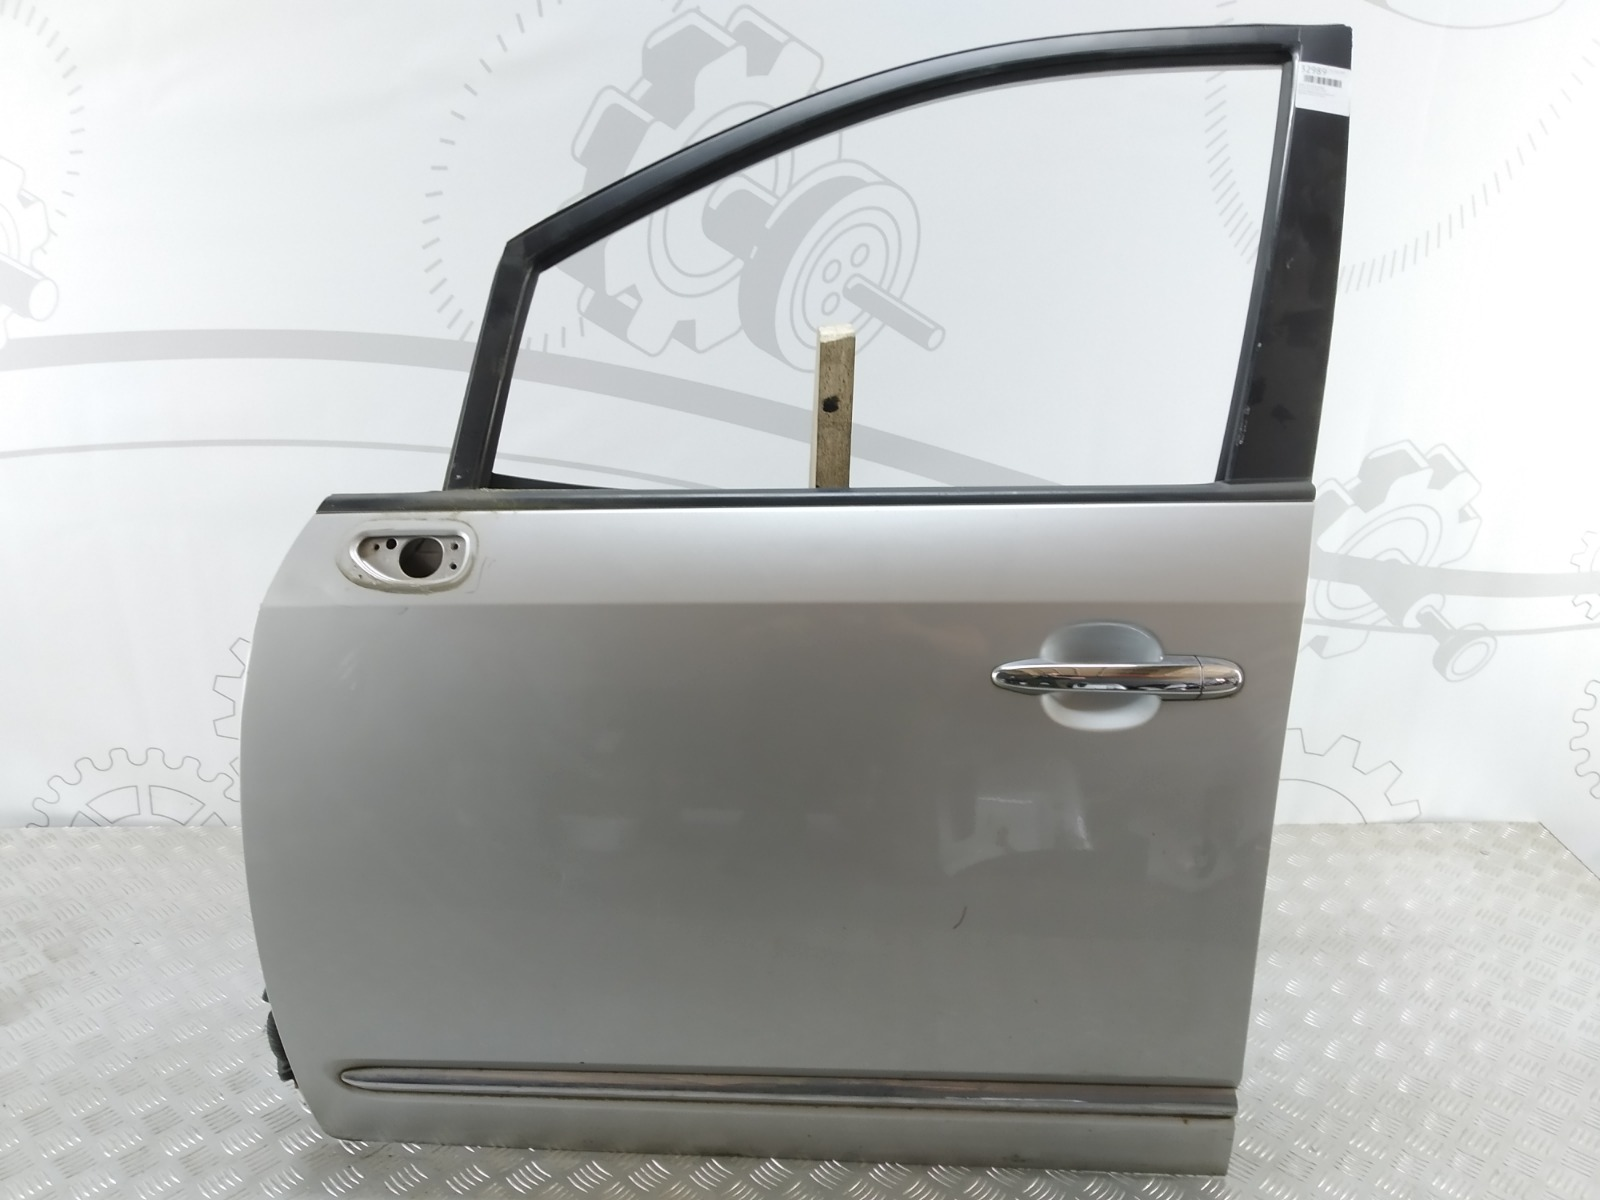 Дверь передняя левая Kia Carens 2.0 CRDI 2006 (б/у)